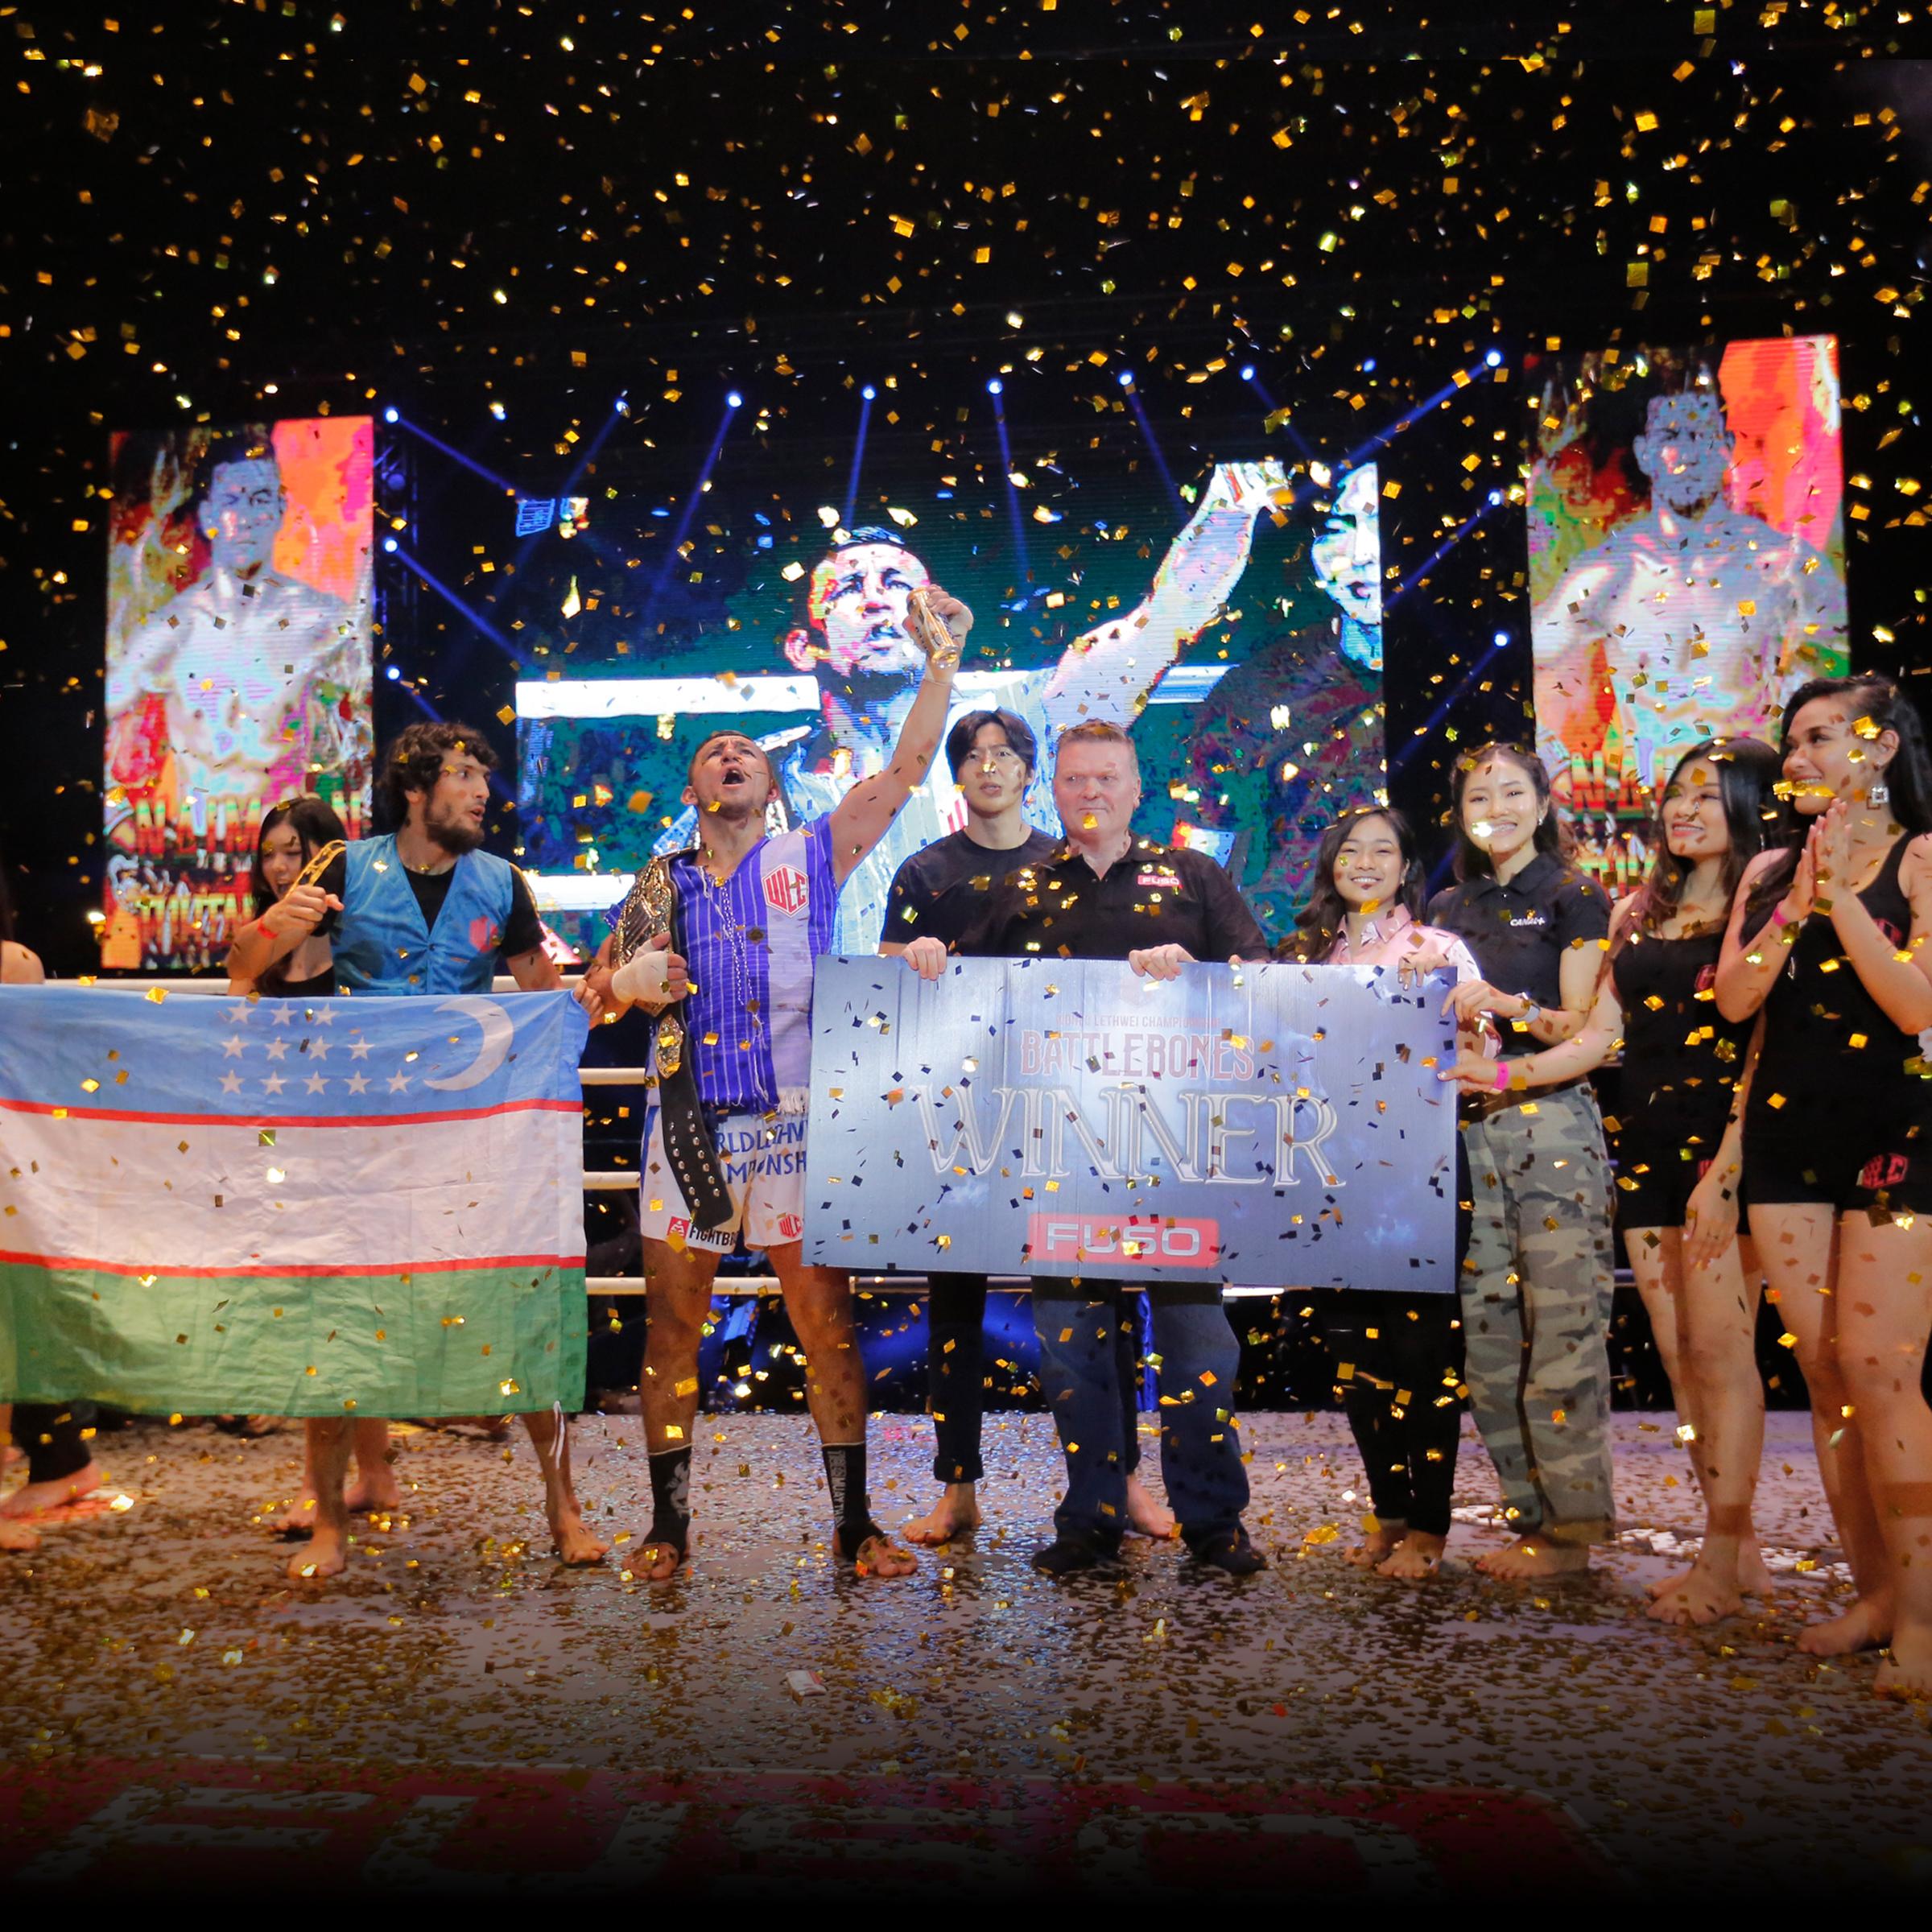 UZBEKISTAN'S NAIMJON TUHTABOYEV BECOMES NEW MIDDLEWEIGHT WORLD LETHWEI CHAMPION -